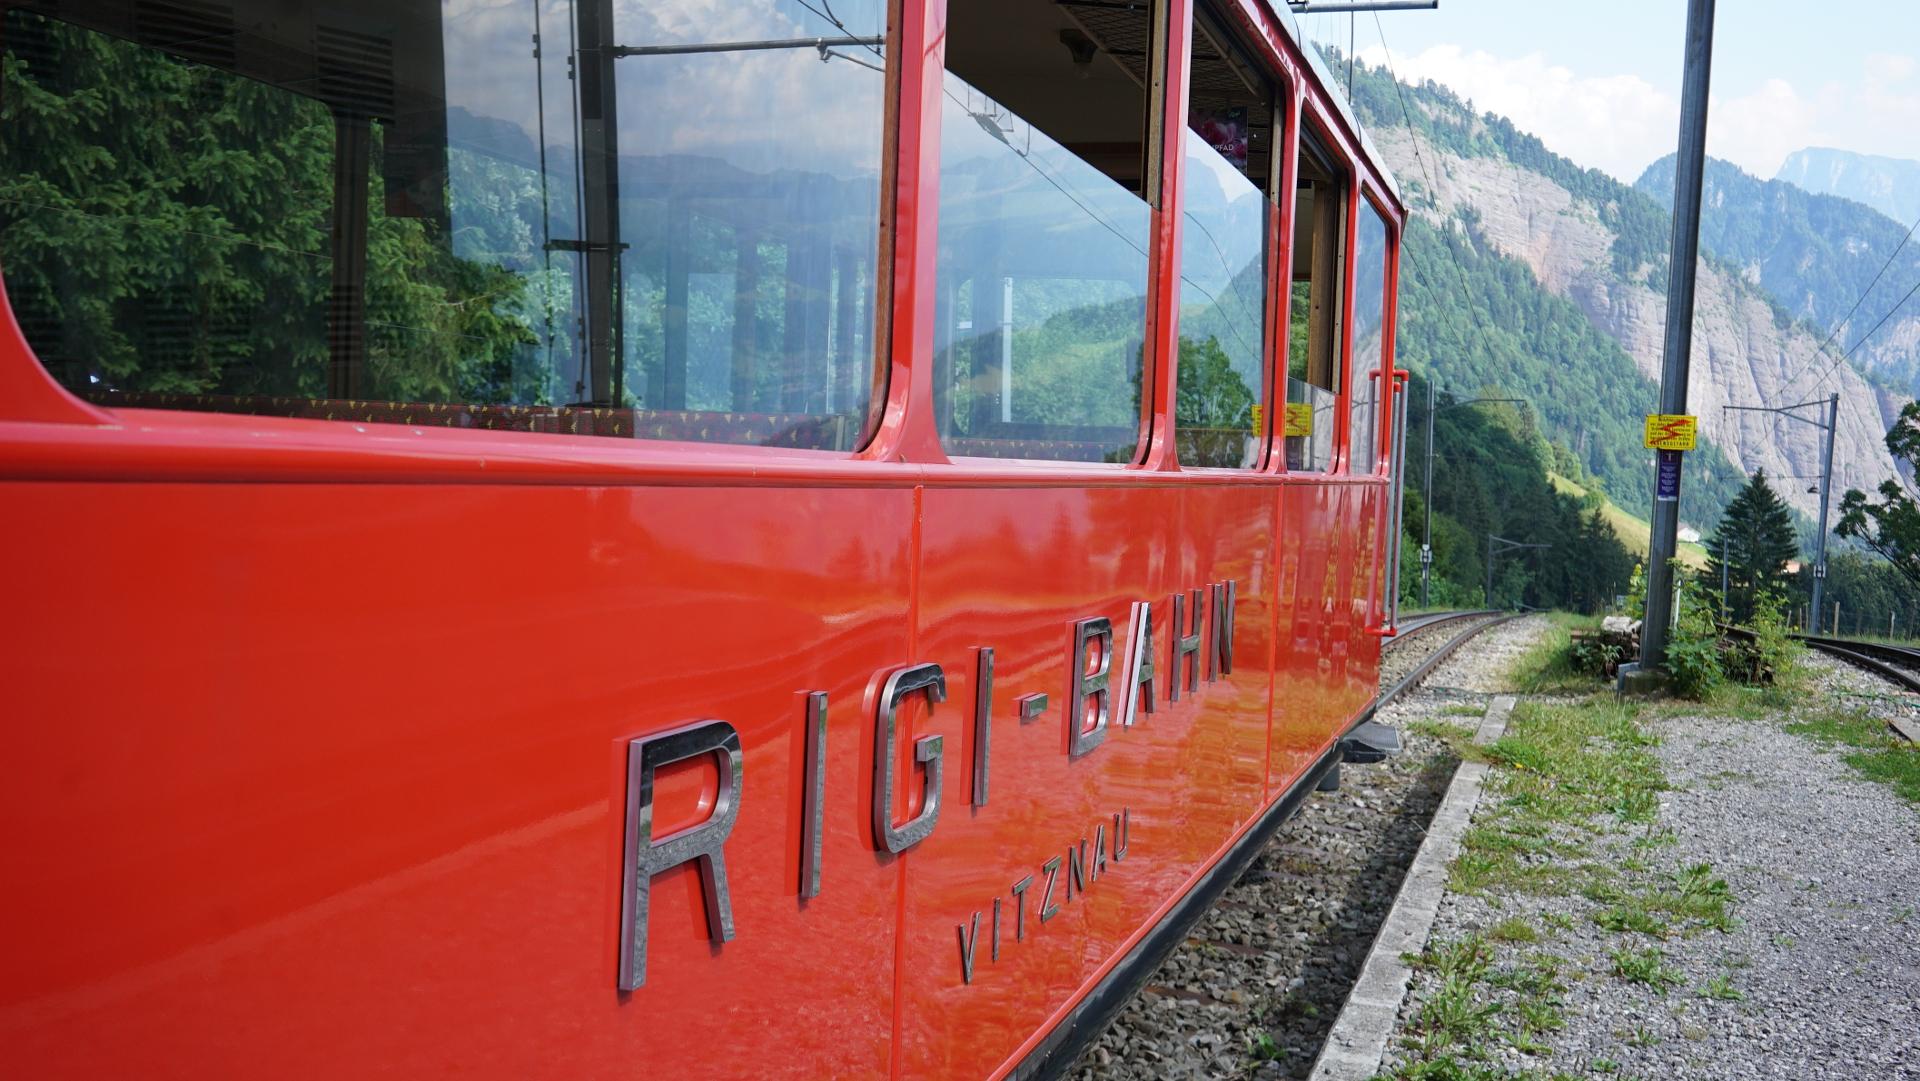 Rigibahn an der Station Romiti